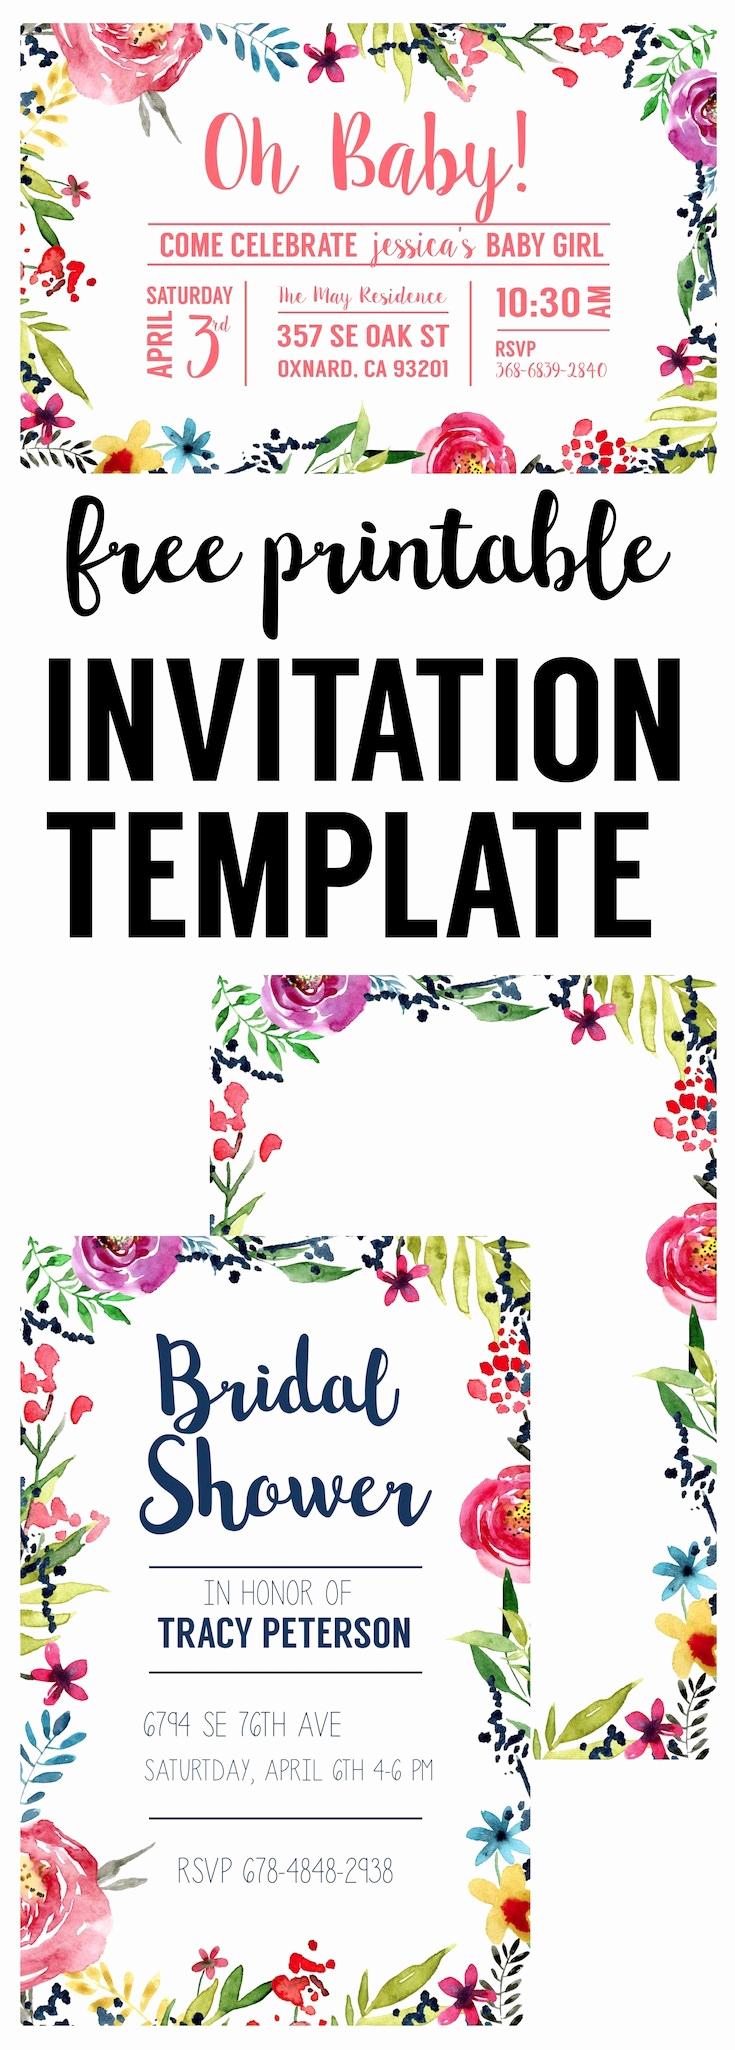 Free Printable Bridal Shower Invitations Elegant Floral Borders Invitations Free Printable Invitation